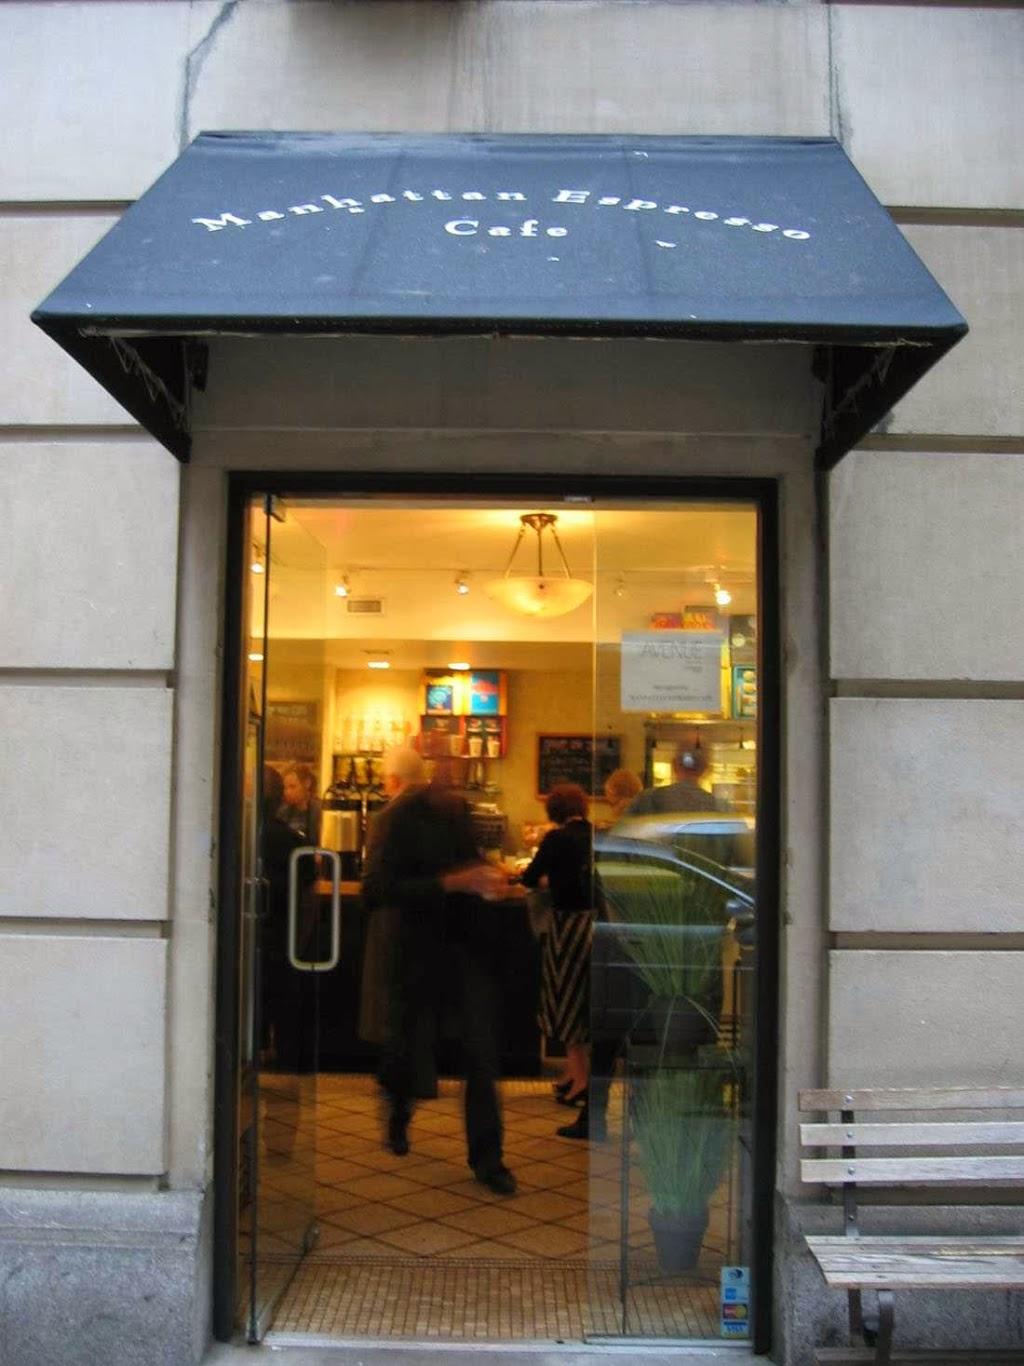 Manhattan Espresso Cafe - bakery  | Photo 1 of 10 | Address: 146 E 49th St, New York, NY 10017, USA | Phone: (212) 832-3010